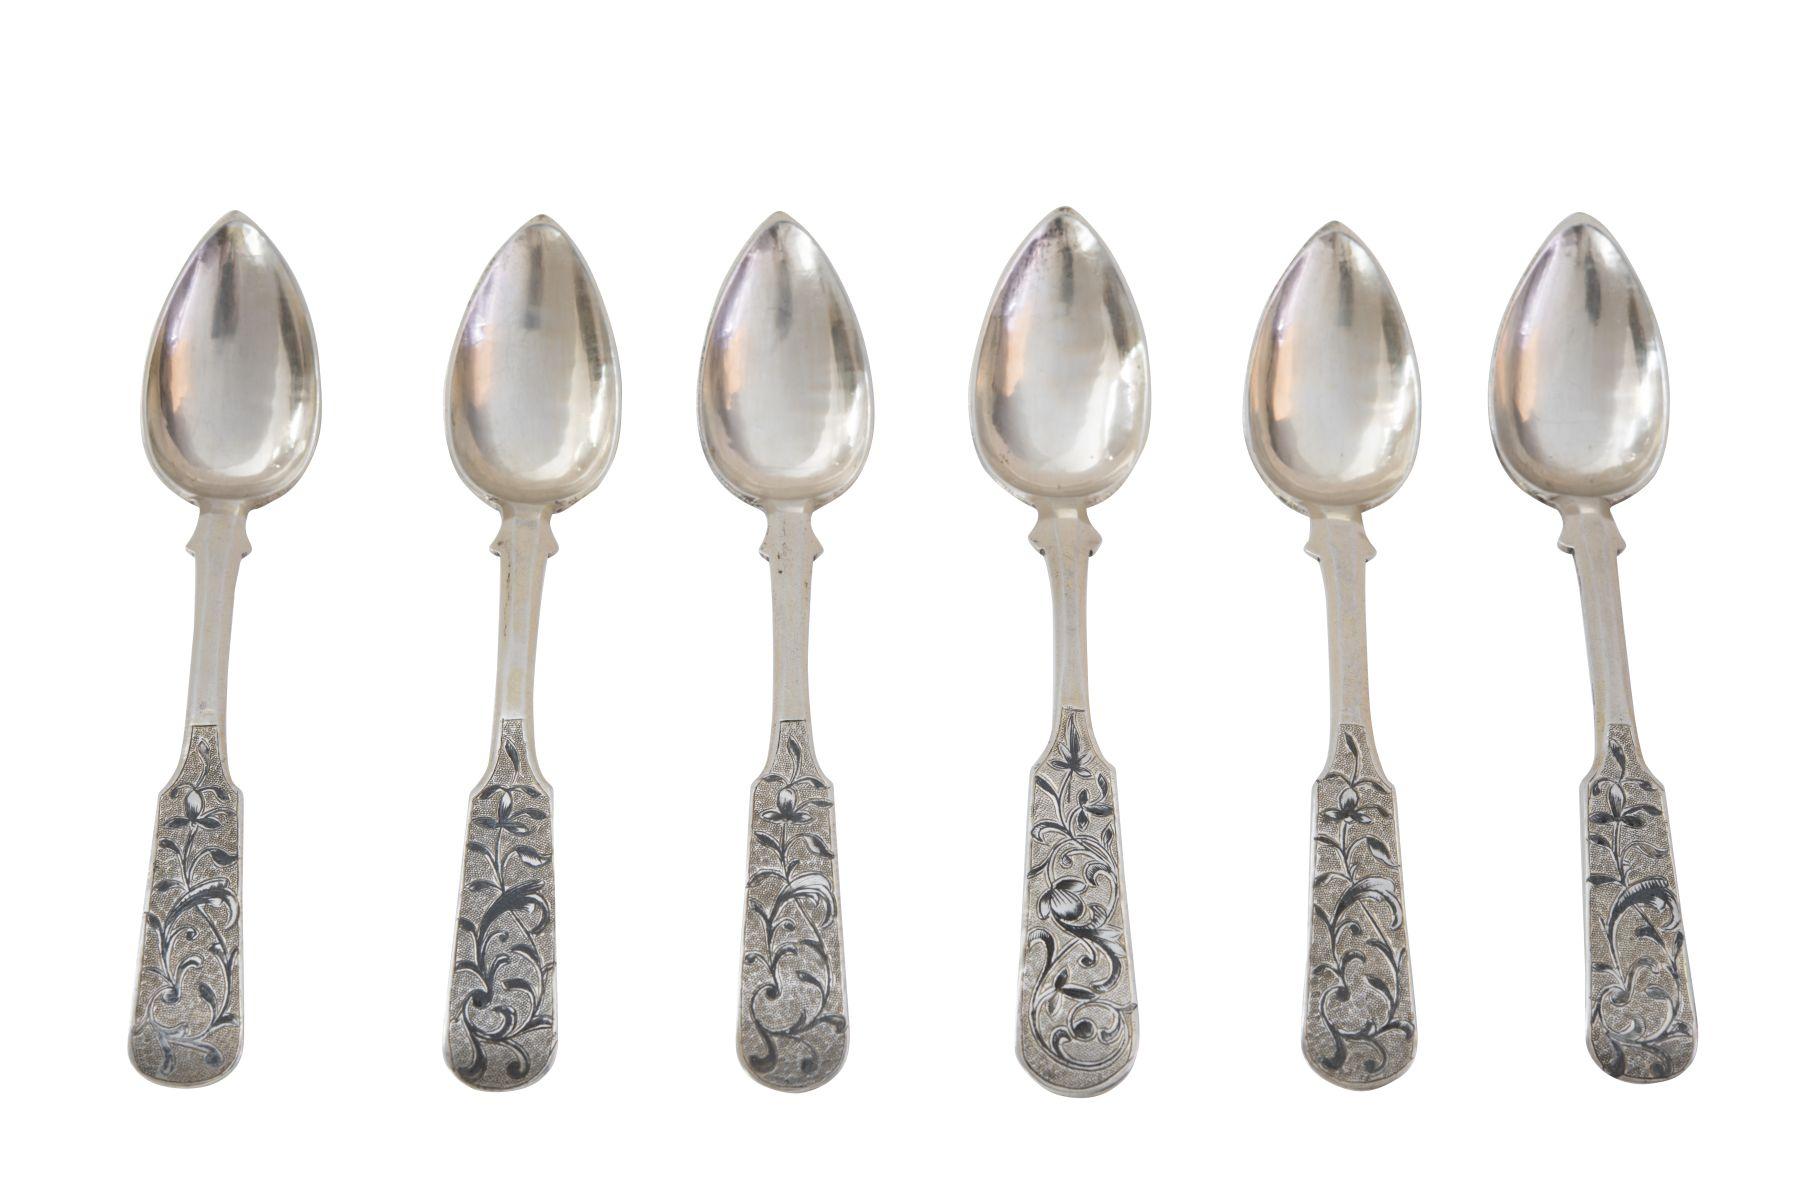 #95 6 Russian dessert spoons | 6 Russische Dessertlöffel Image